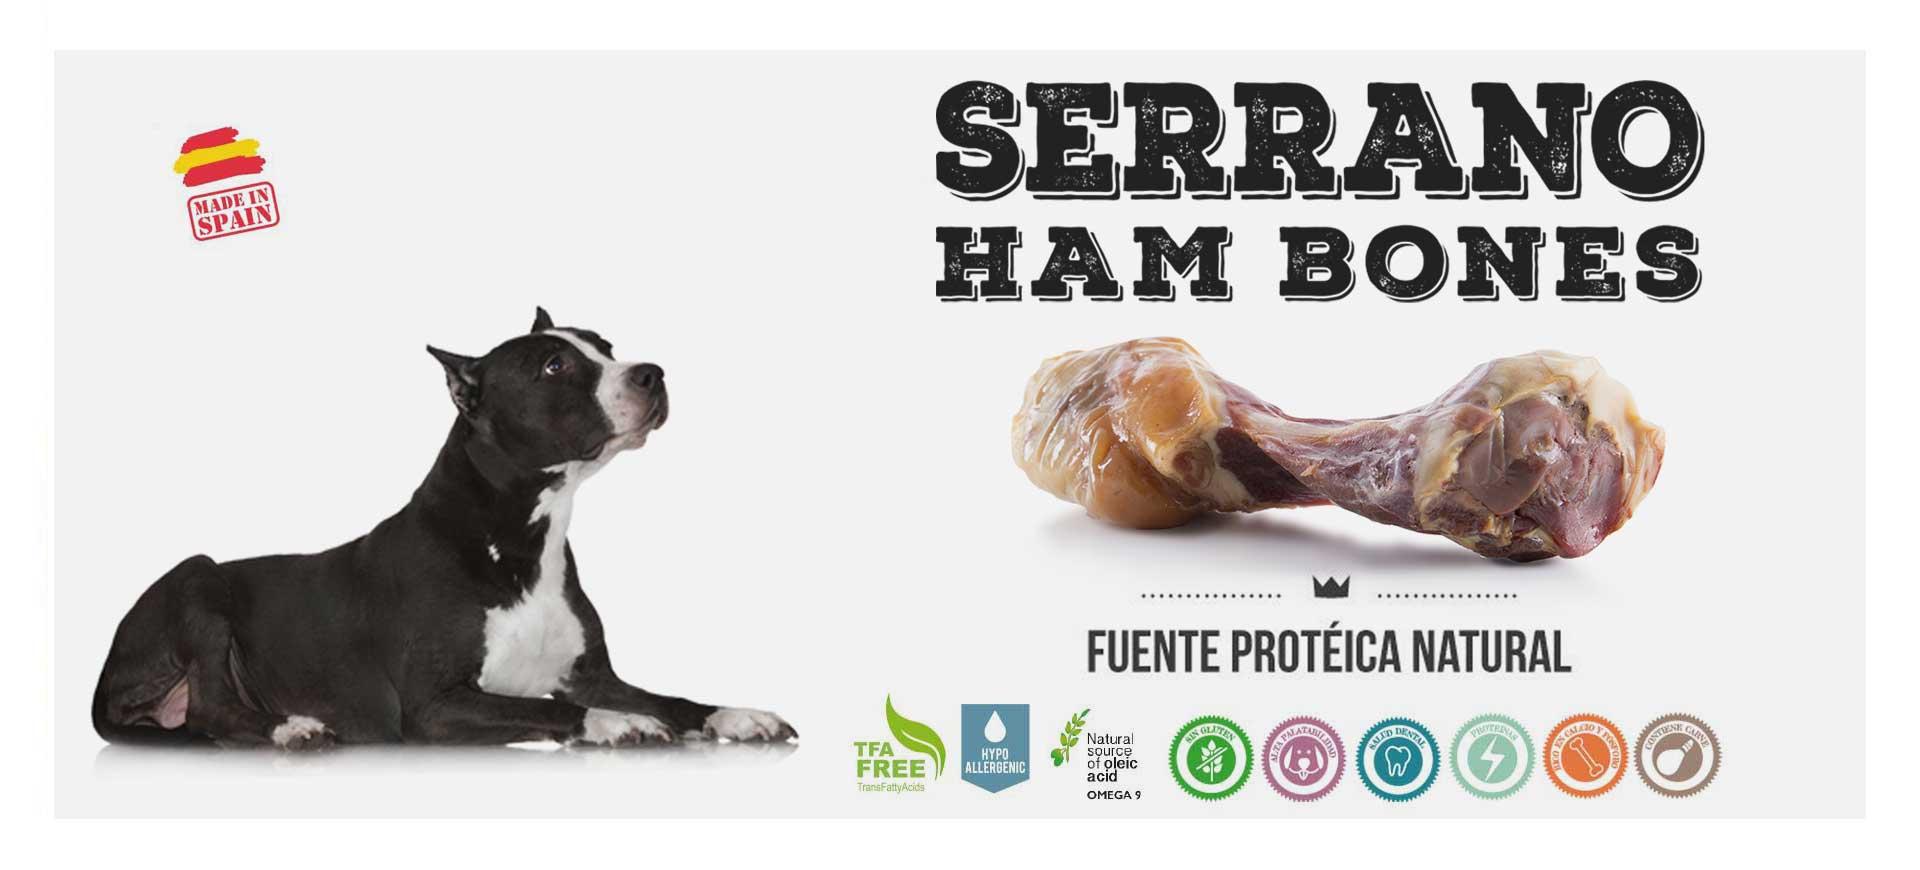 Huesos de jamón serrano para perros de Mediterranean Natural